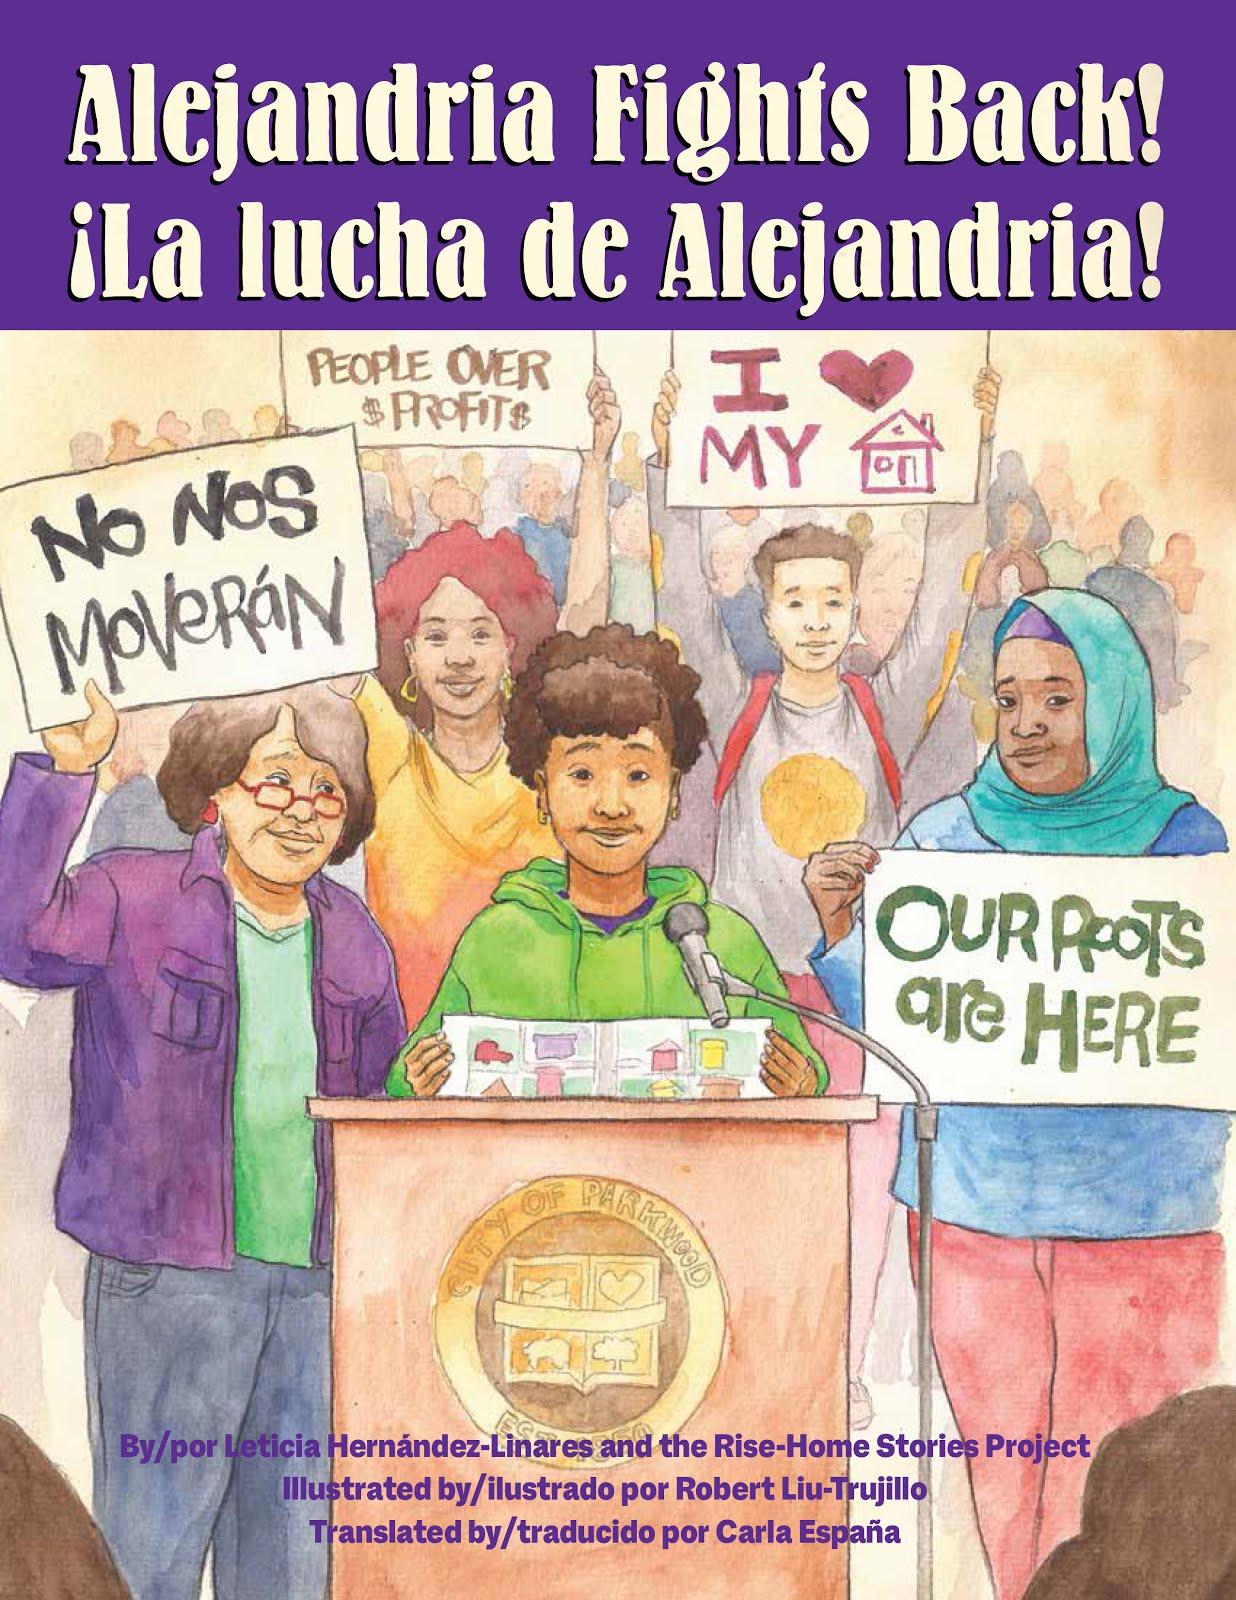 Alejandria Fights Back!